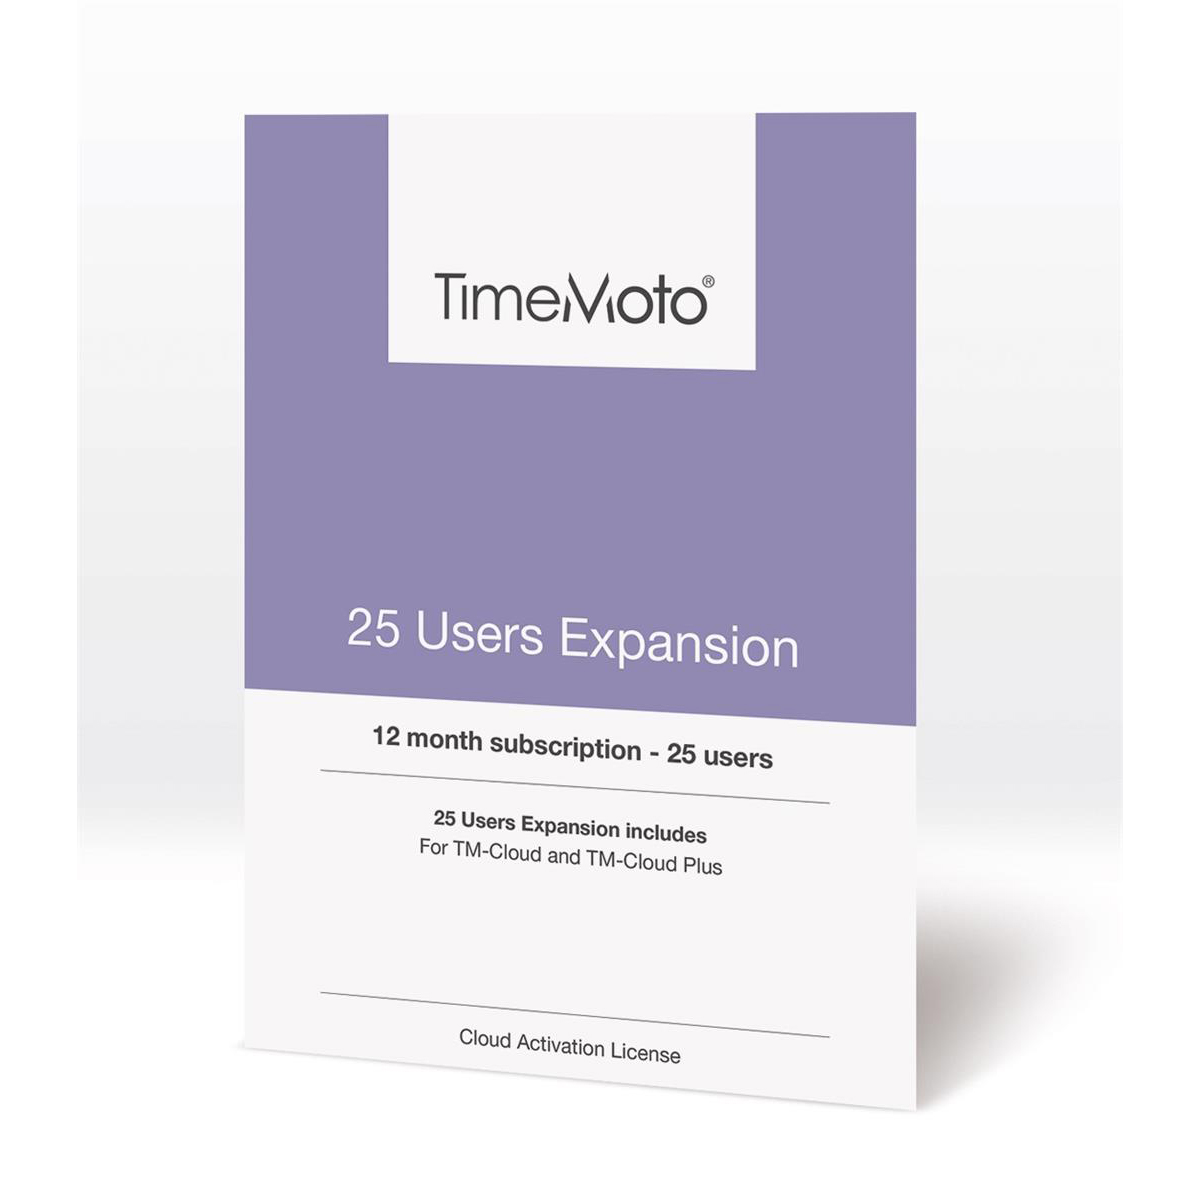 Safescan TimeMoto TM Cloud User Expansion 25 Users Ref 139-0592